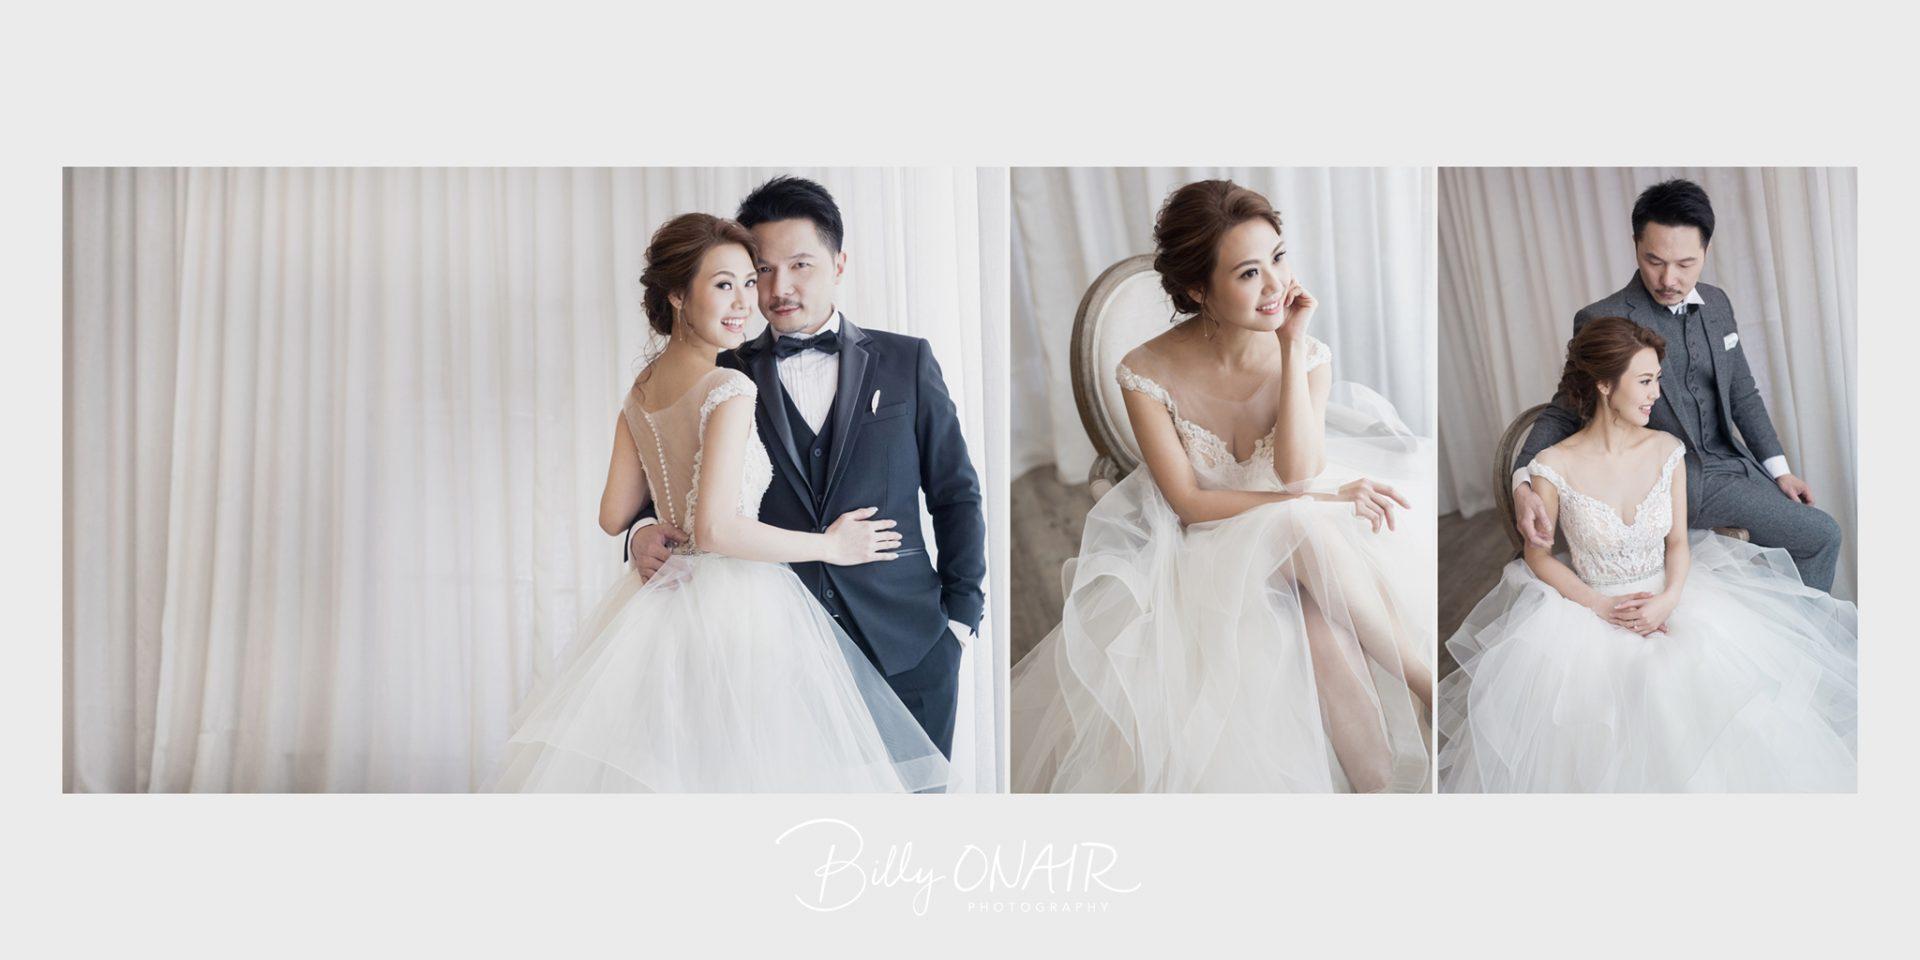 hk_pre_wedding_10